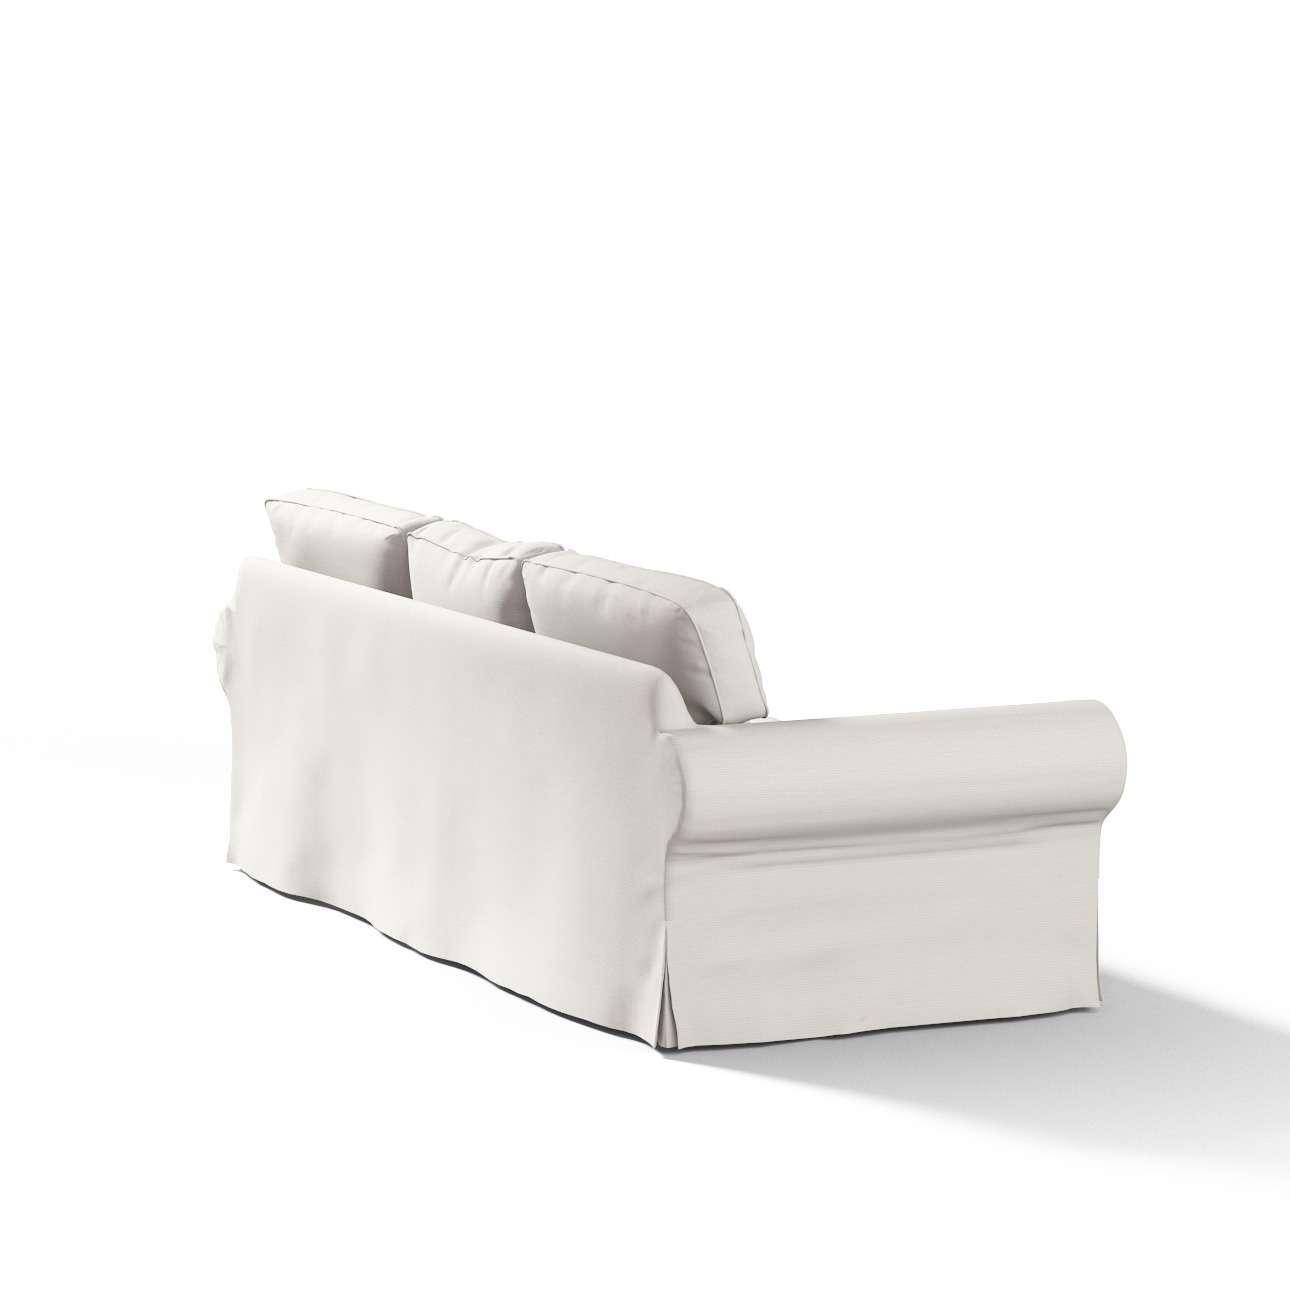 Ektorp 3-Sitzer Schlafsofabezug neues Modell (2013) Ektorp 3-Sitzer, ausklappbar, neues Modell ( 2013) von der Kollektion Cotton Panama, Stoff: 702-31